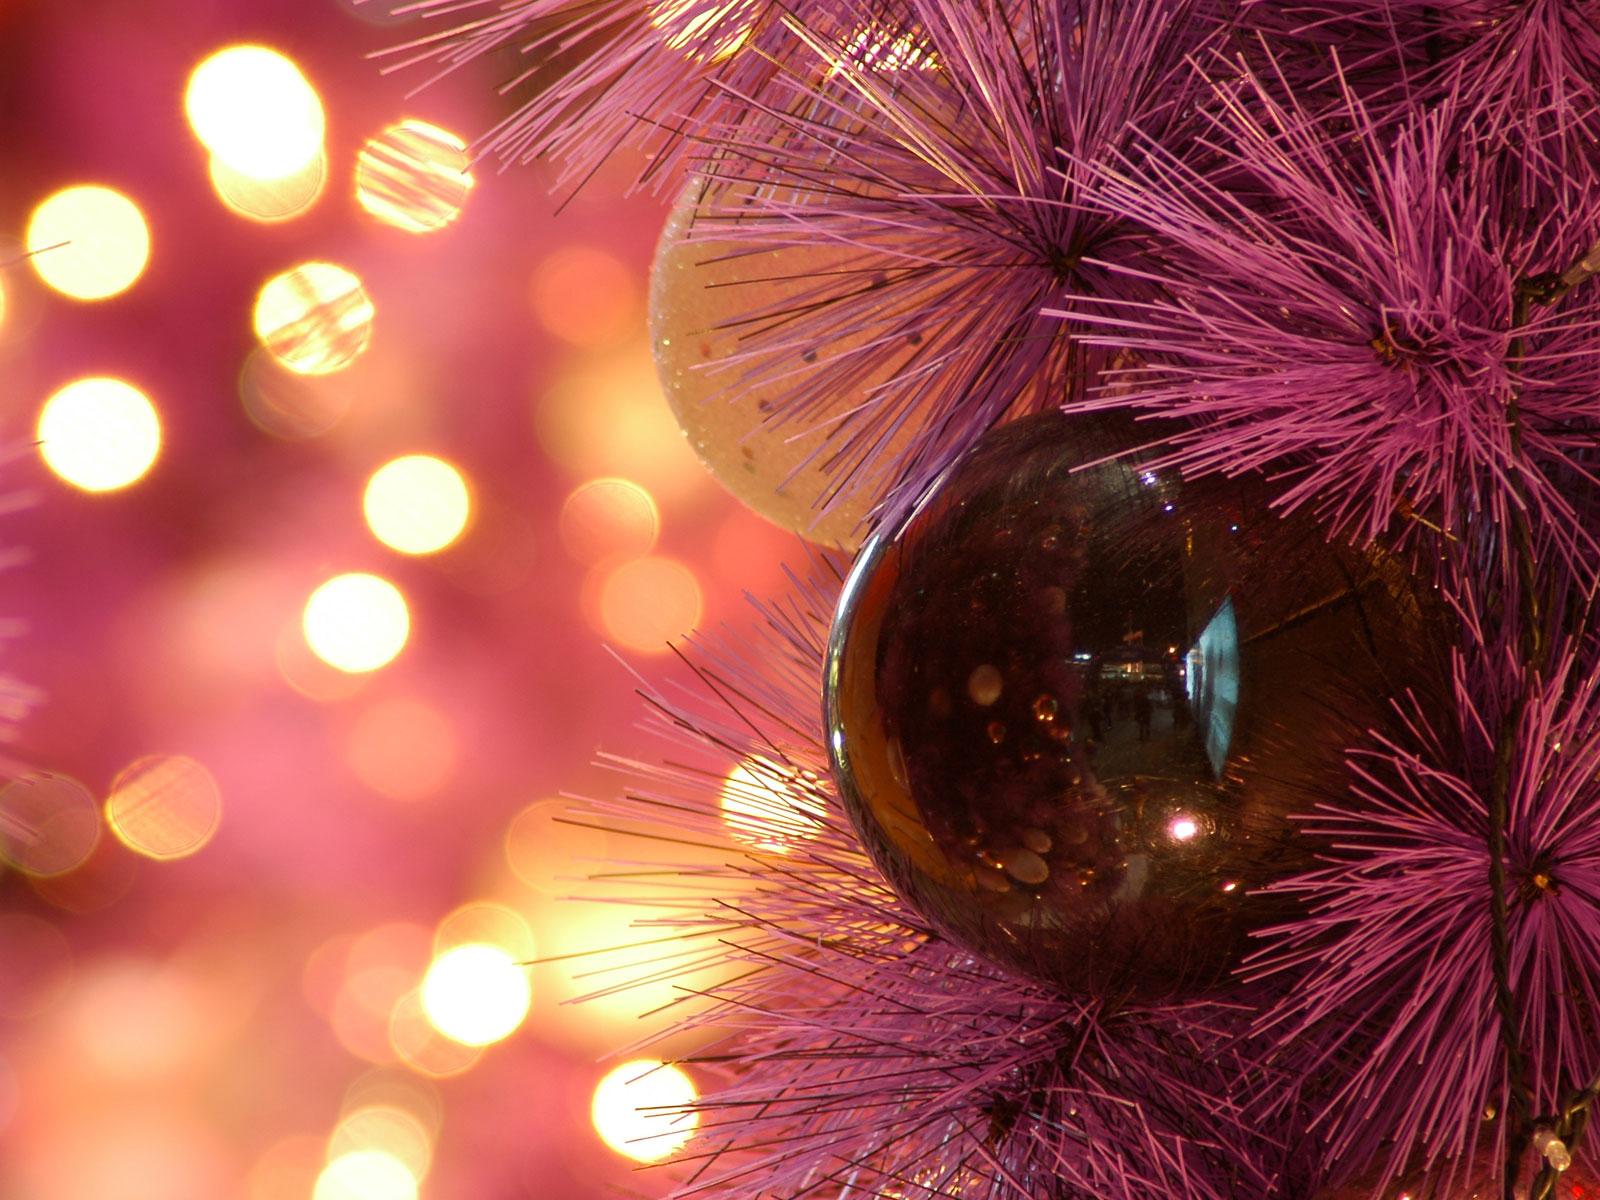 Christmas Lights Photography Tumblr Wallpaper Free Desktop I HD